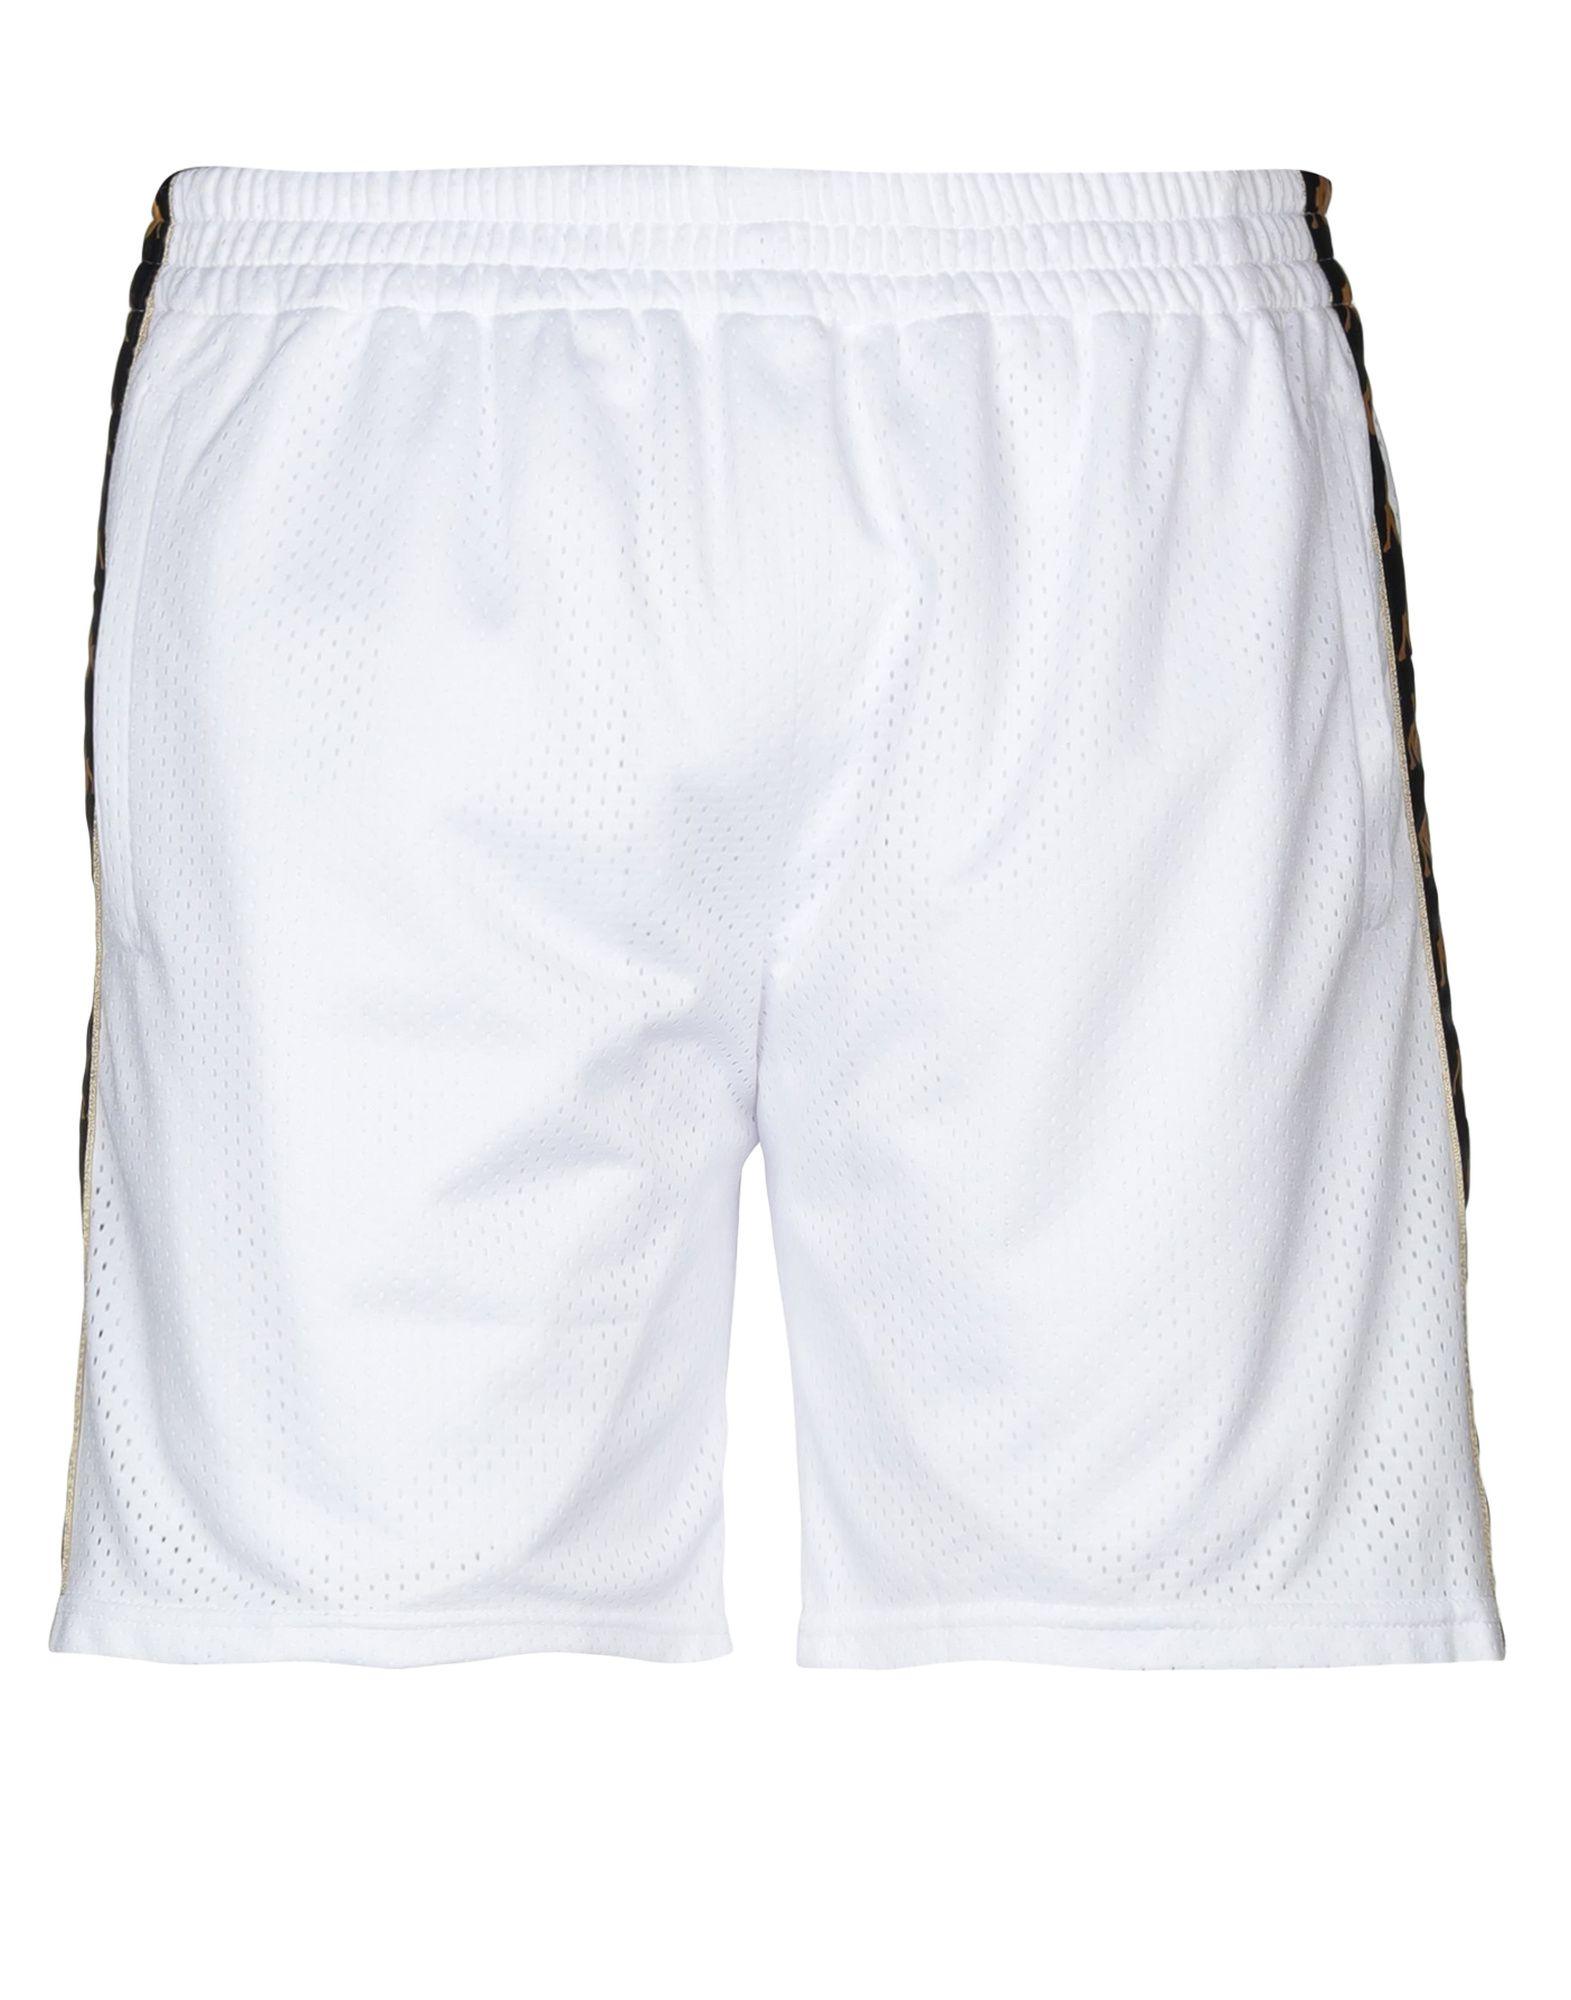 KAPPA x FAITH CONNEXION Повседневные шорты kappa плавки шорты мужские kappa размер 48